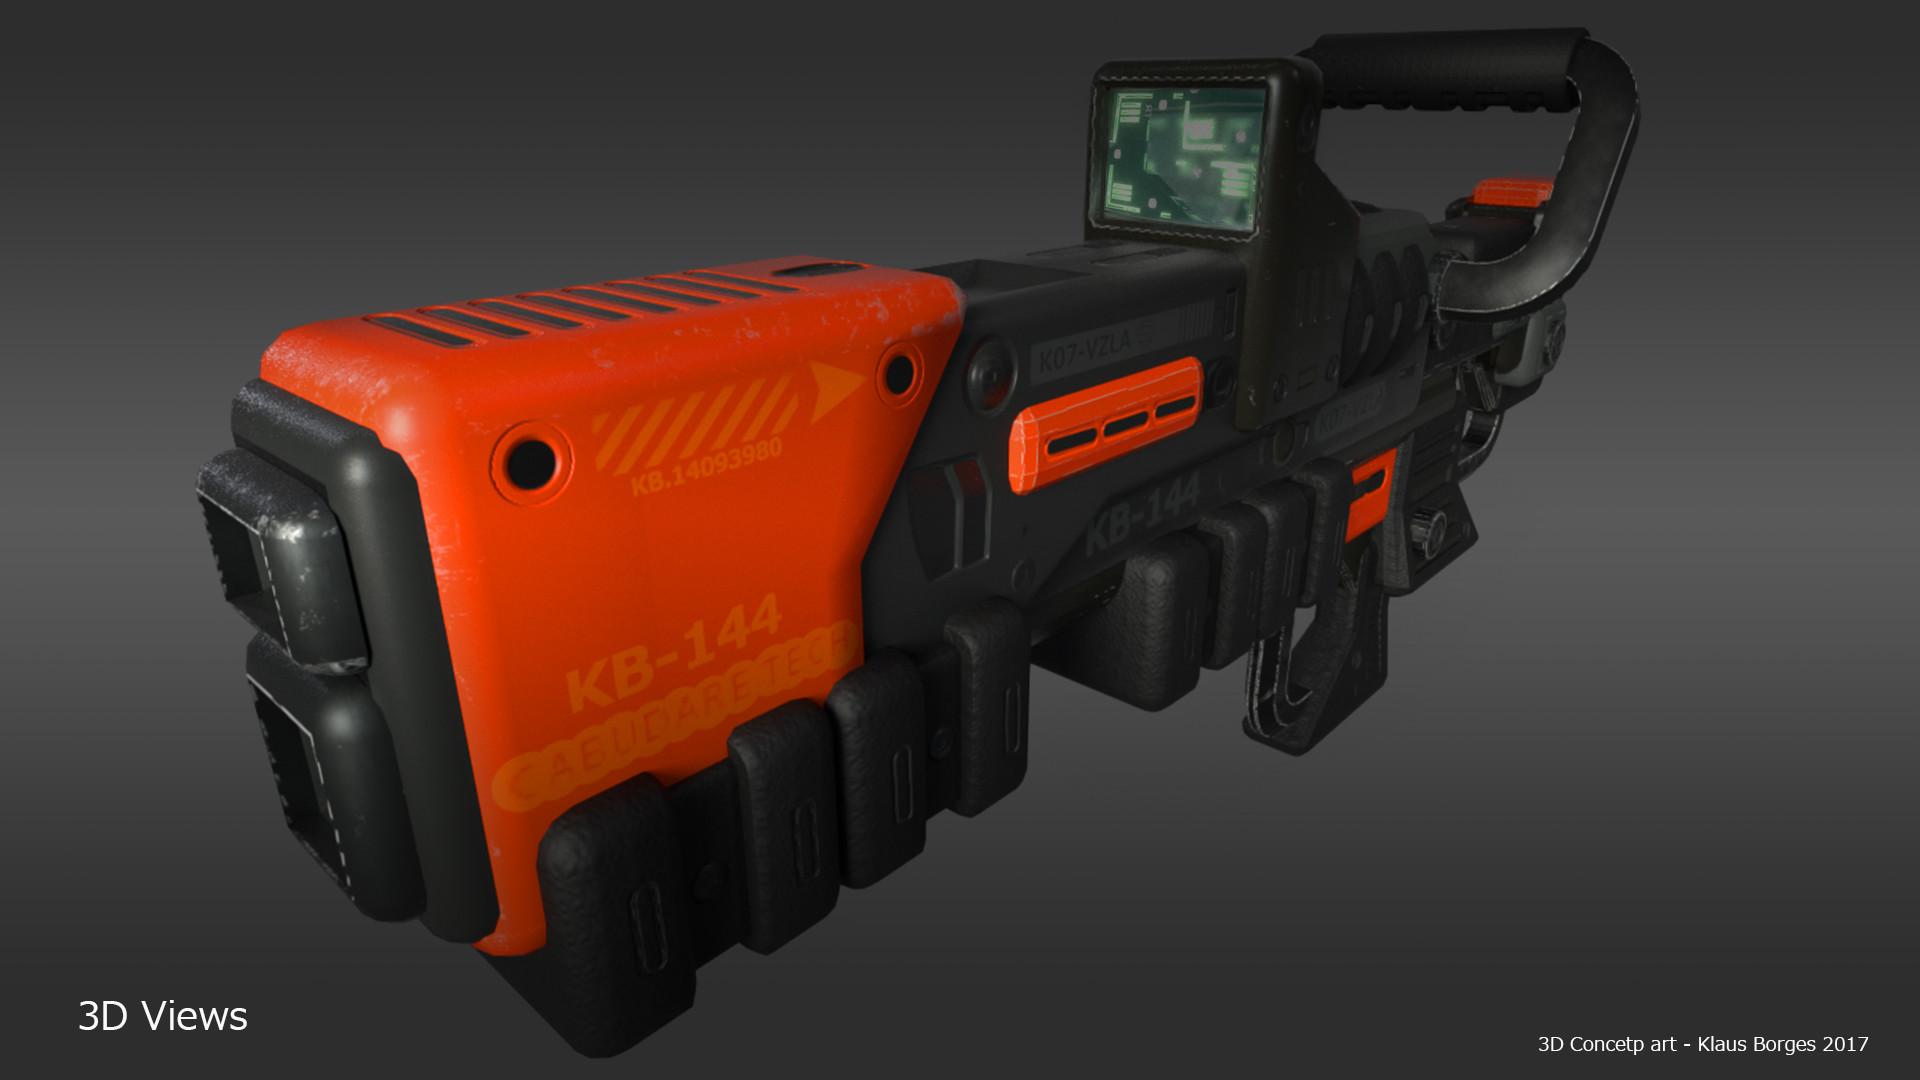 Klaus borges mockup rifle2 orange